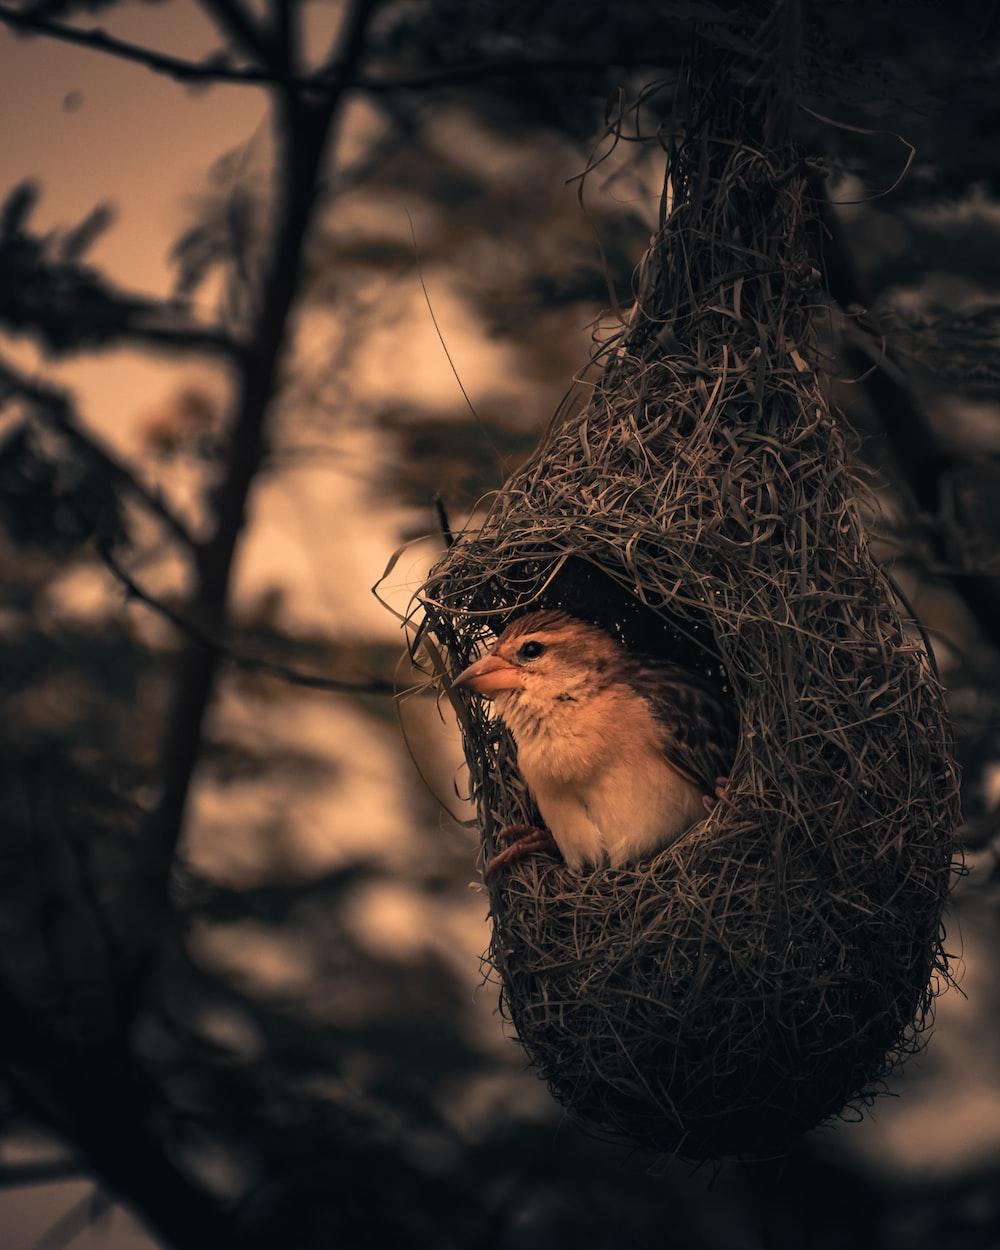 brown bird inside brown birds nest